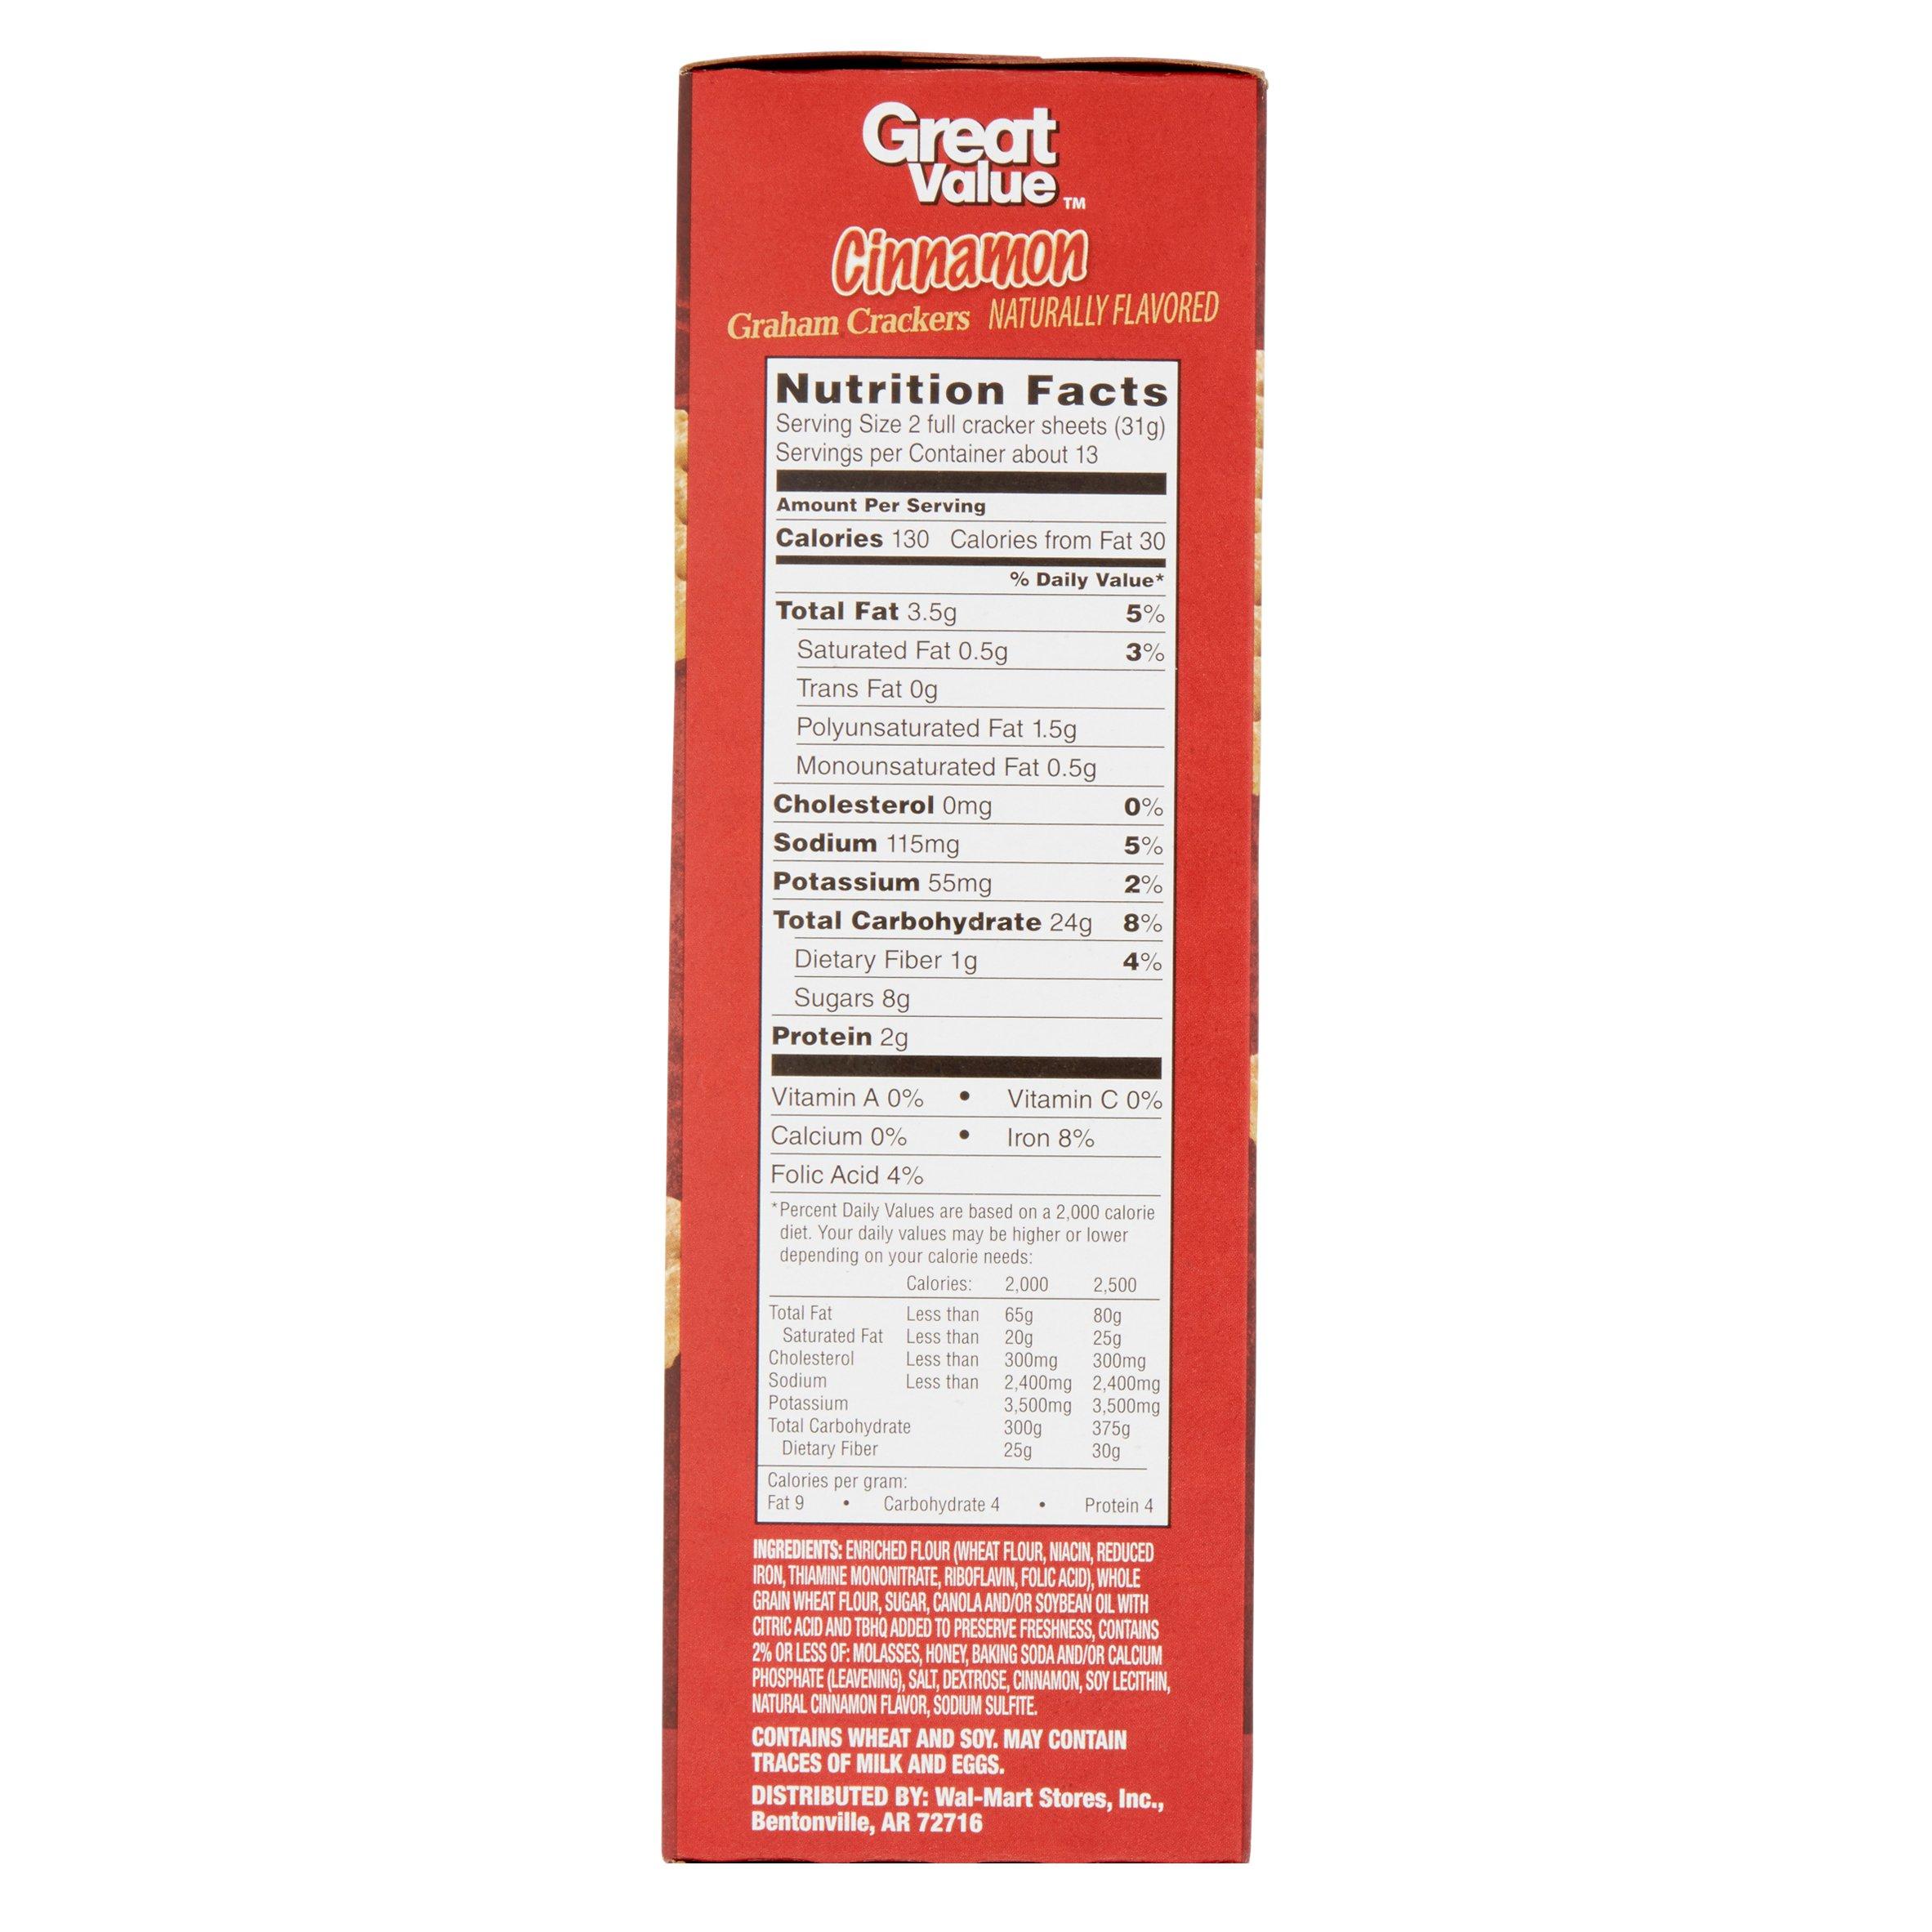 Great Value Graham Crackers, Cinnamon, 3 Count, 14.4 oz - Walmart.com